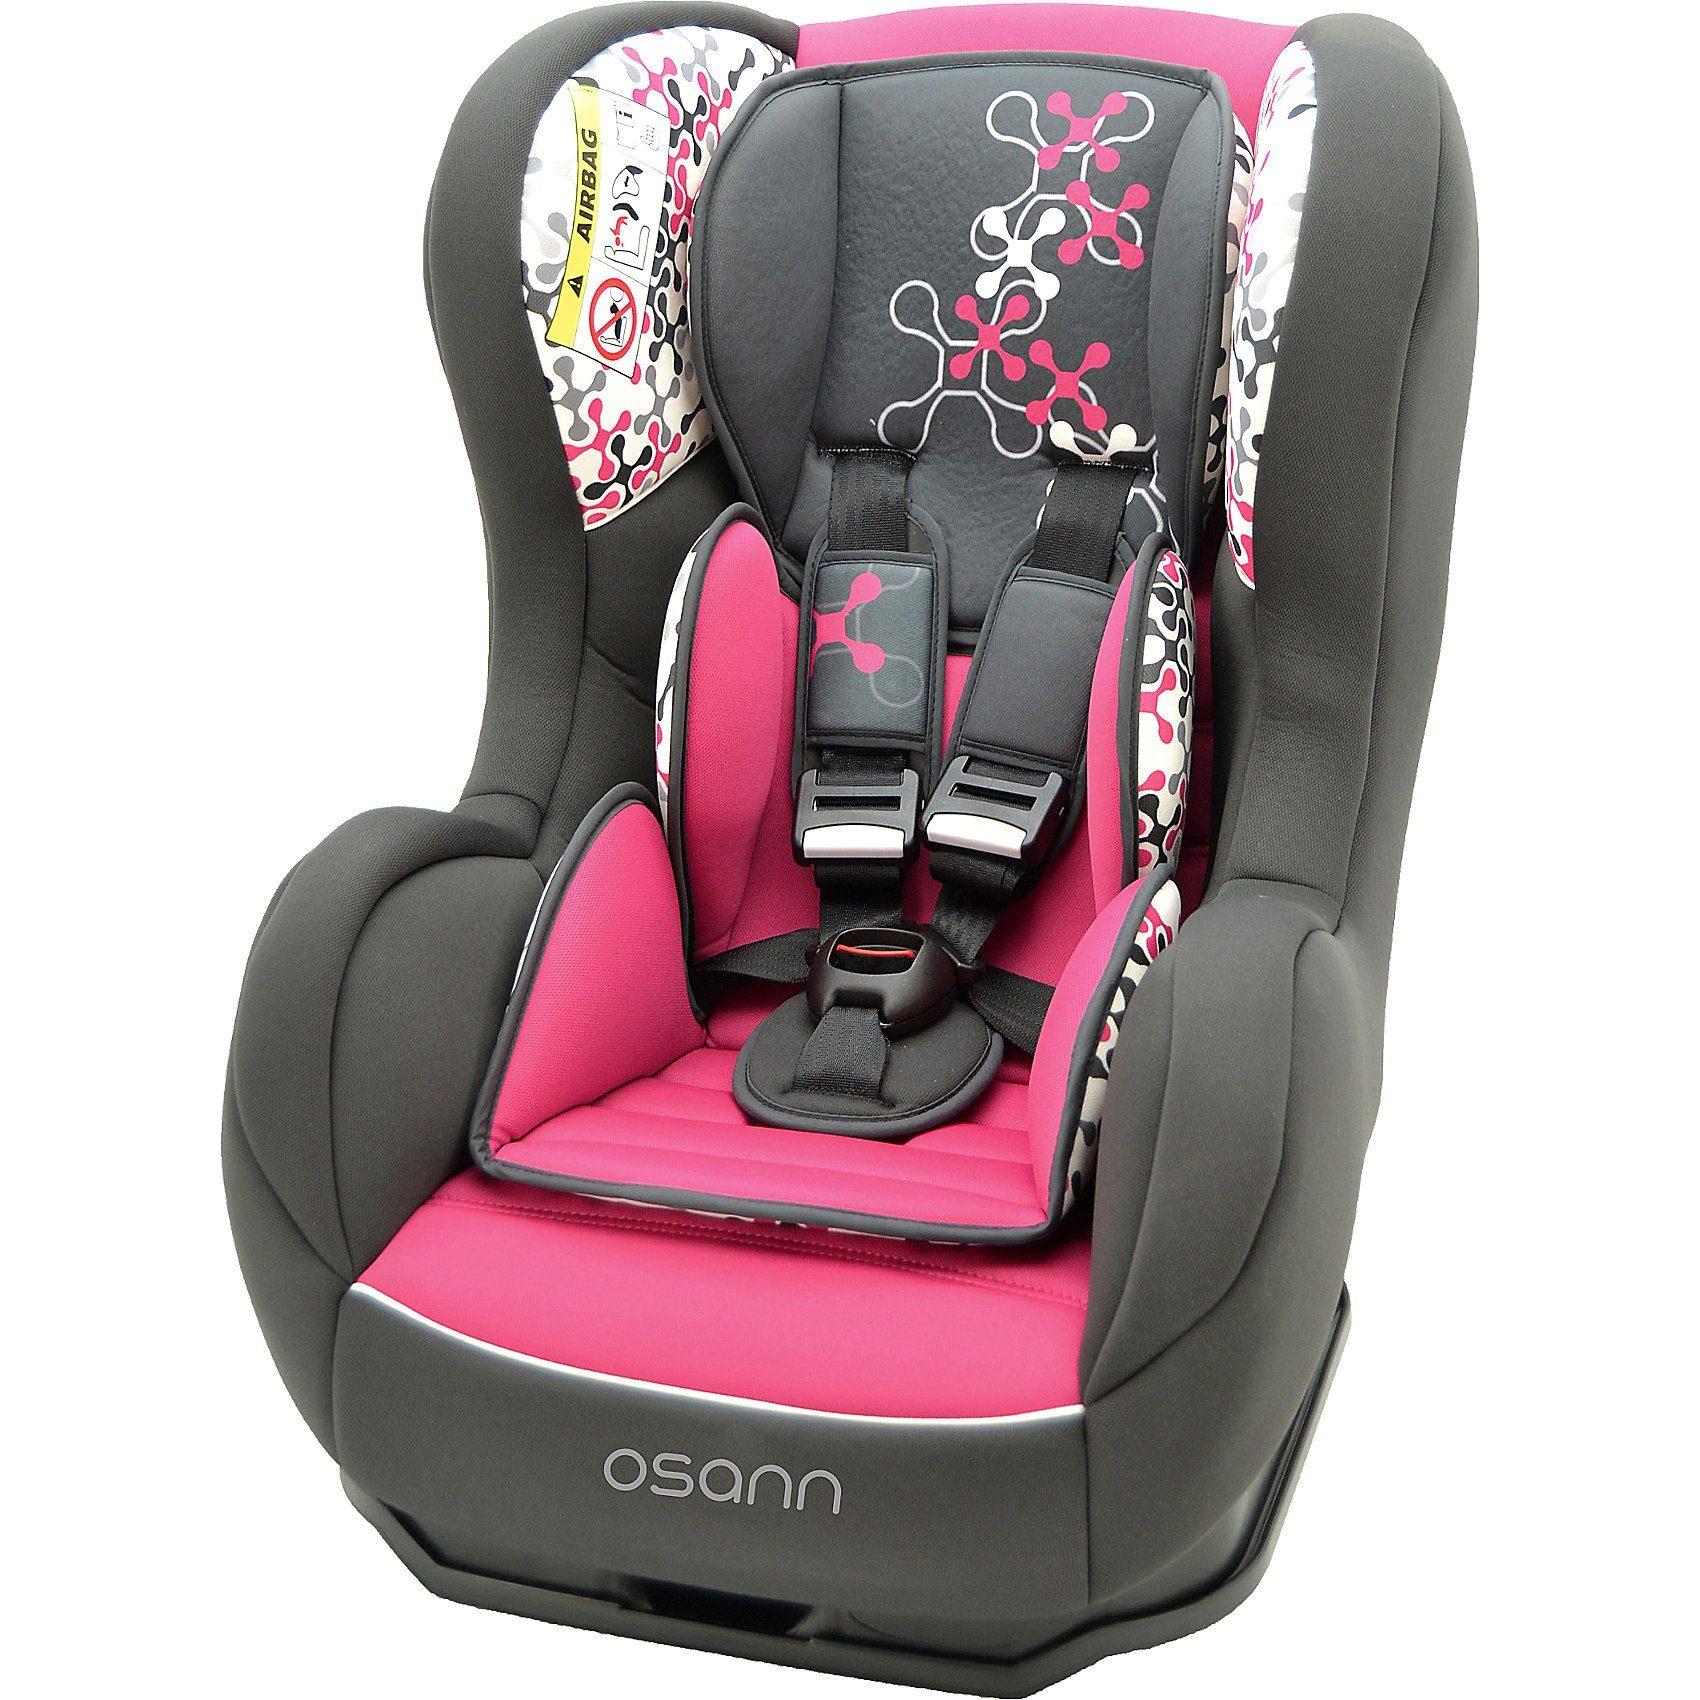 Osann Auto-Kindersitz Cosmo SP, Corail Framboise, 2017